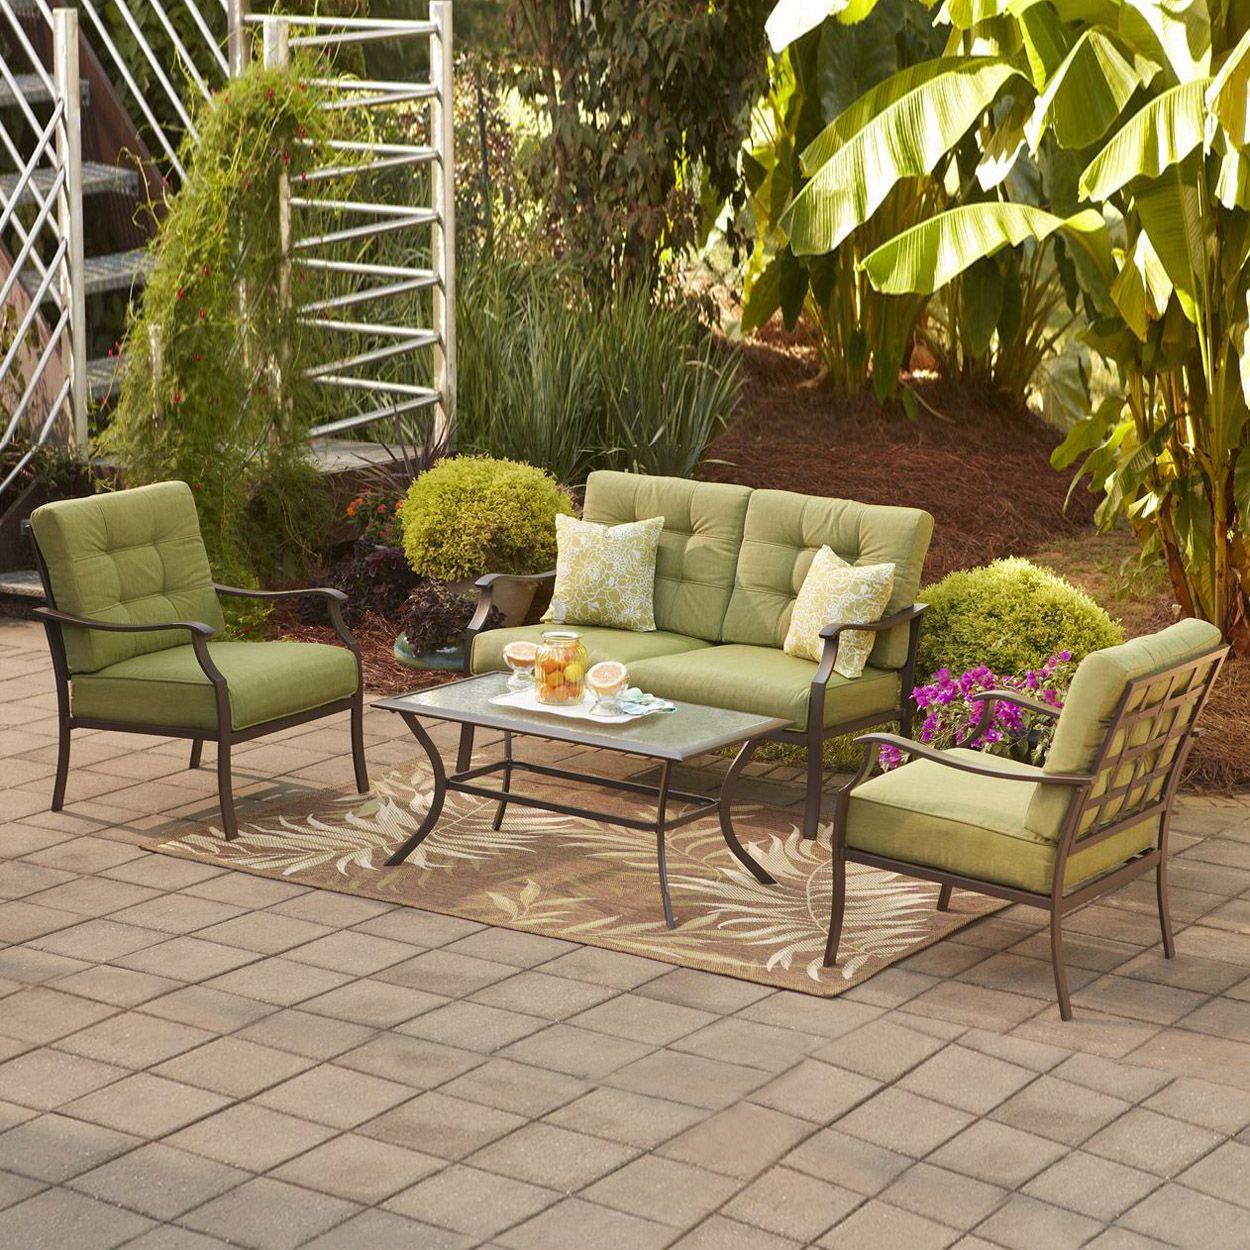 Garden treasures eastmoreland green 4piece outdoor